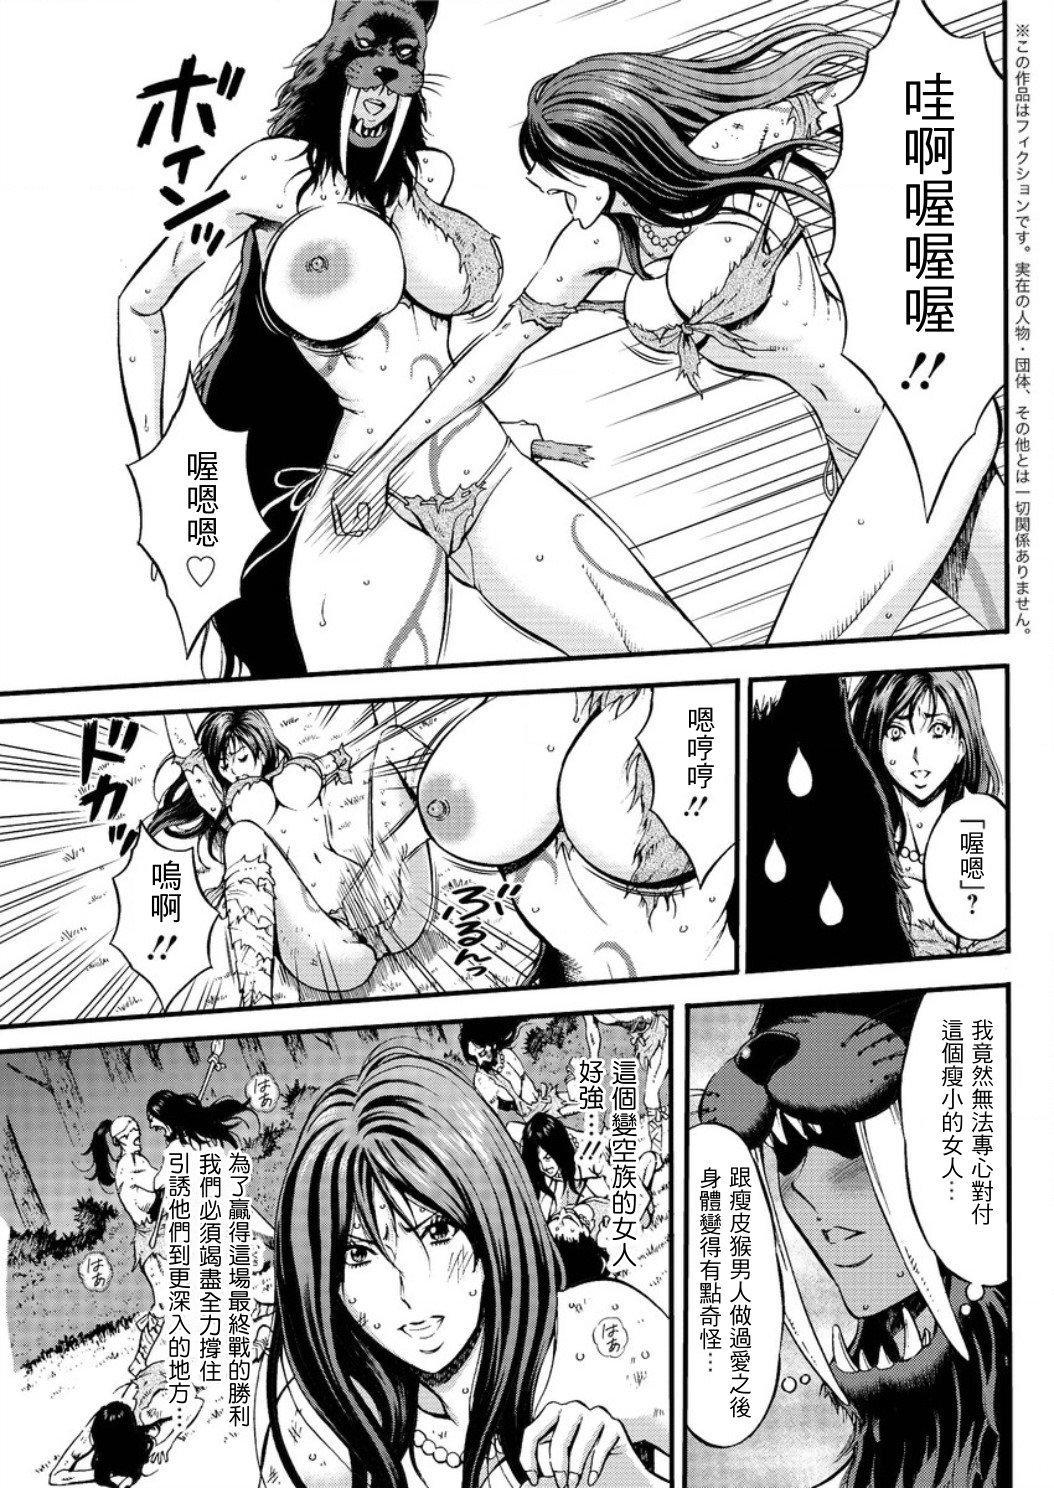 Kigenzen 10000 Nen no Ota | 史前一萬年的宅男 Ch. 19-24 75